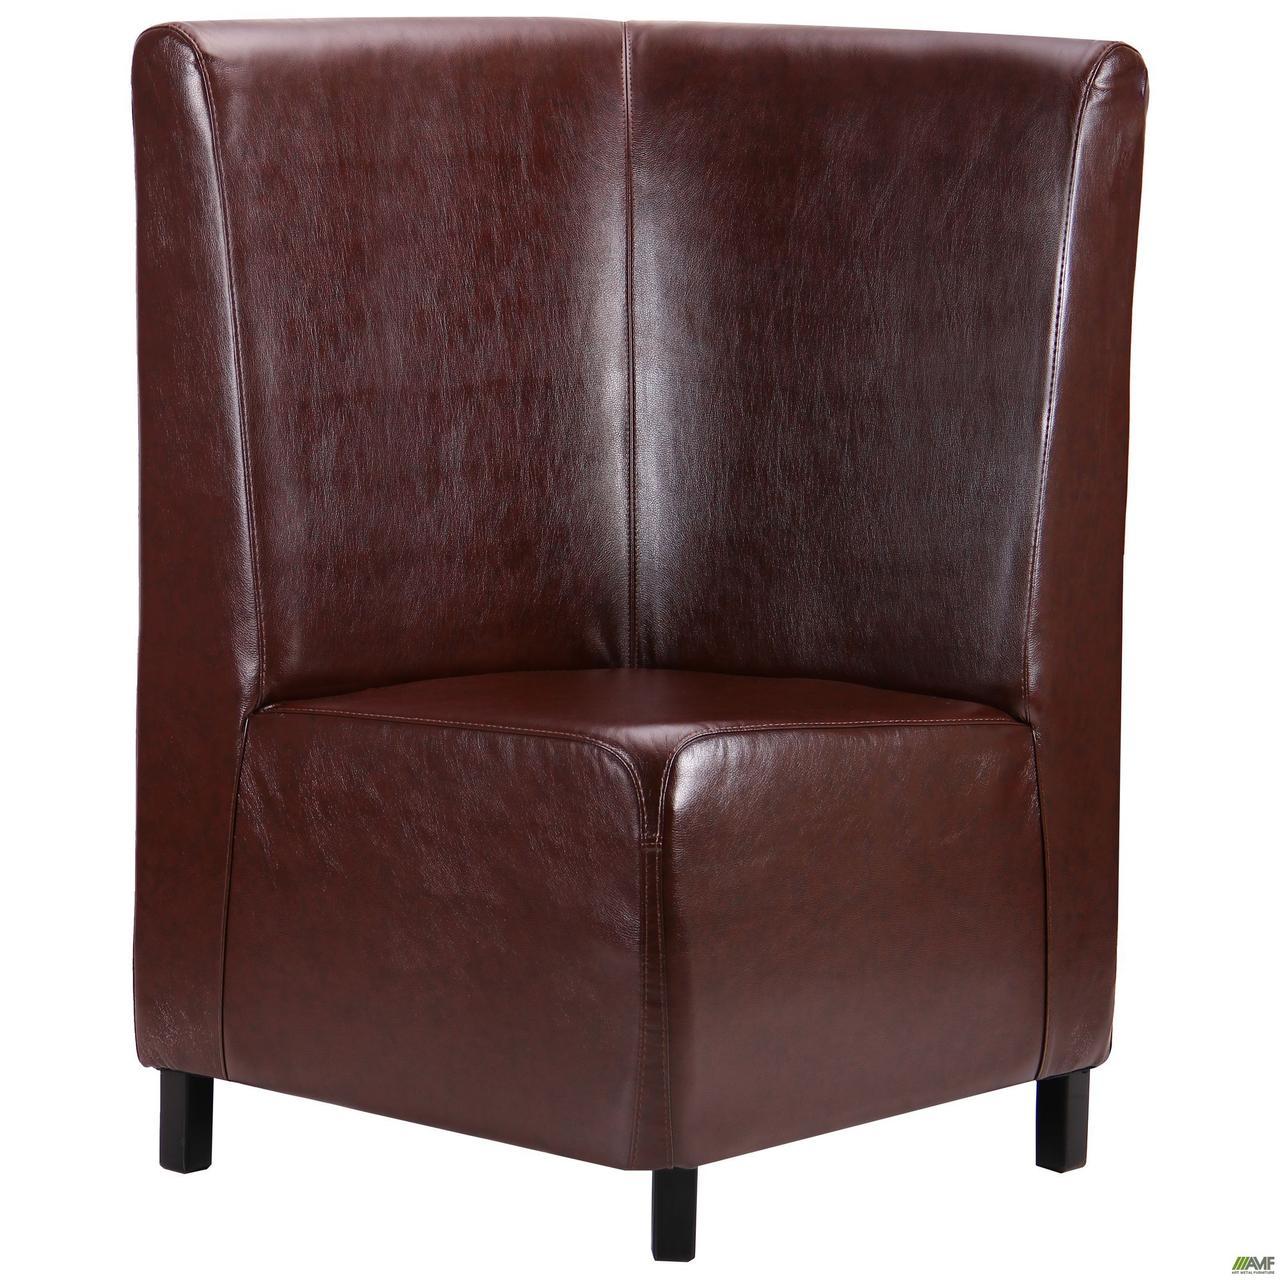 Кутовий Диван Хіт на ніжках (Н100), венге, 670*670*1100Н Мадрас дк браун